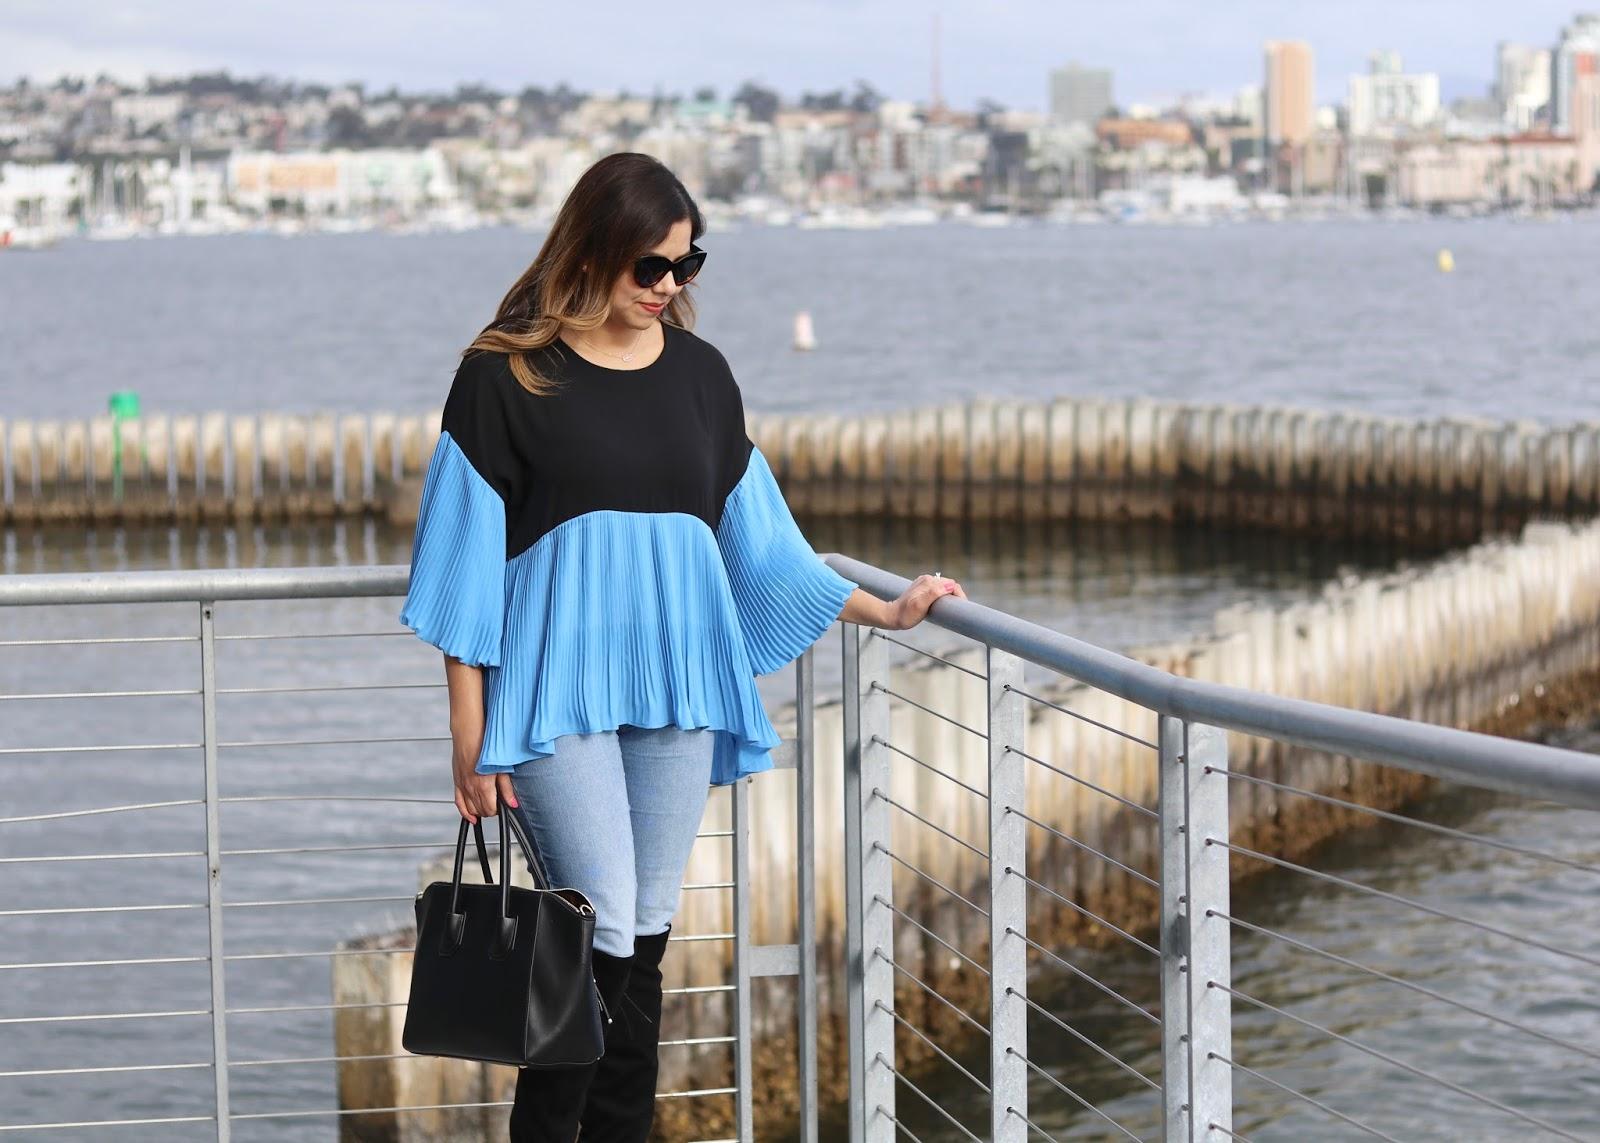 Coasterra Restaurant, Latina Fashion Blogger, Mexican Fashion Blogger